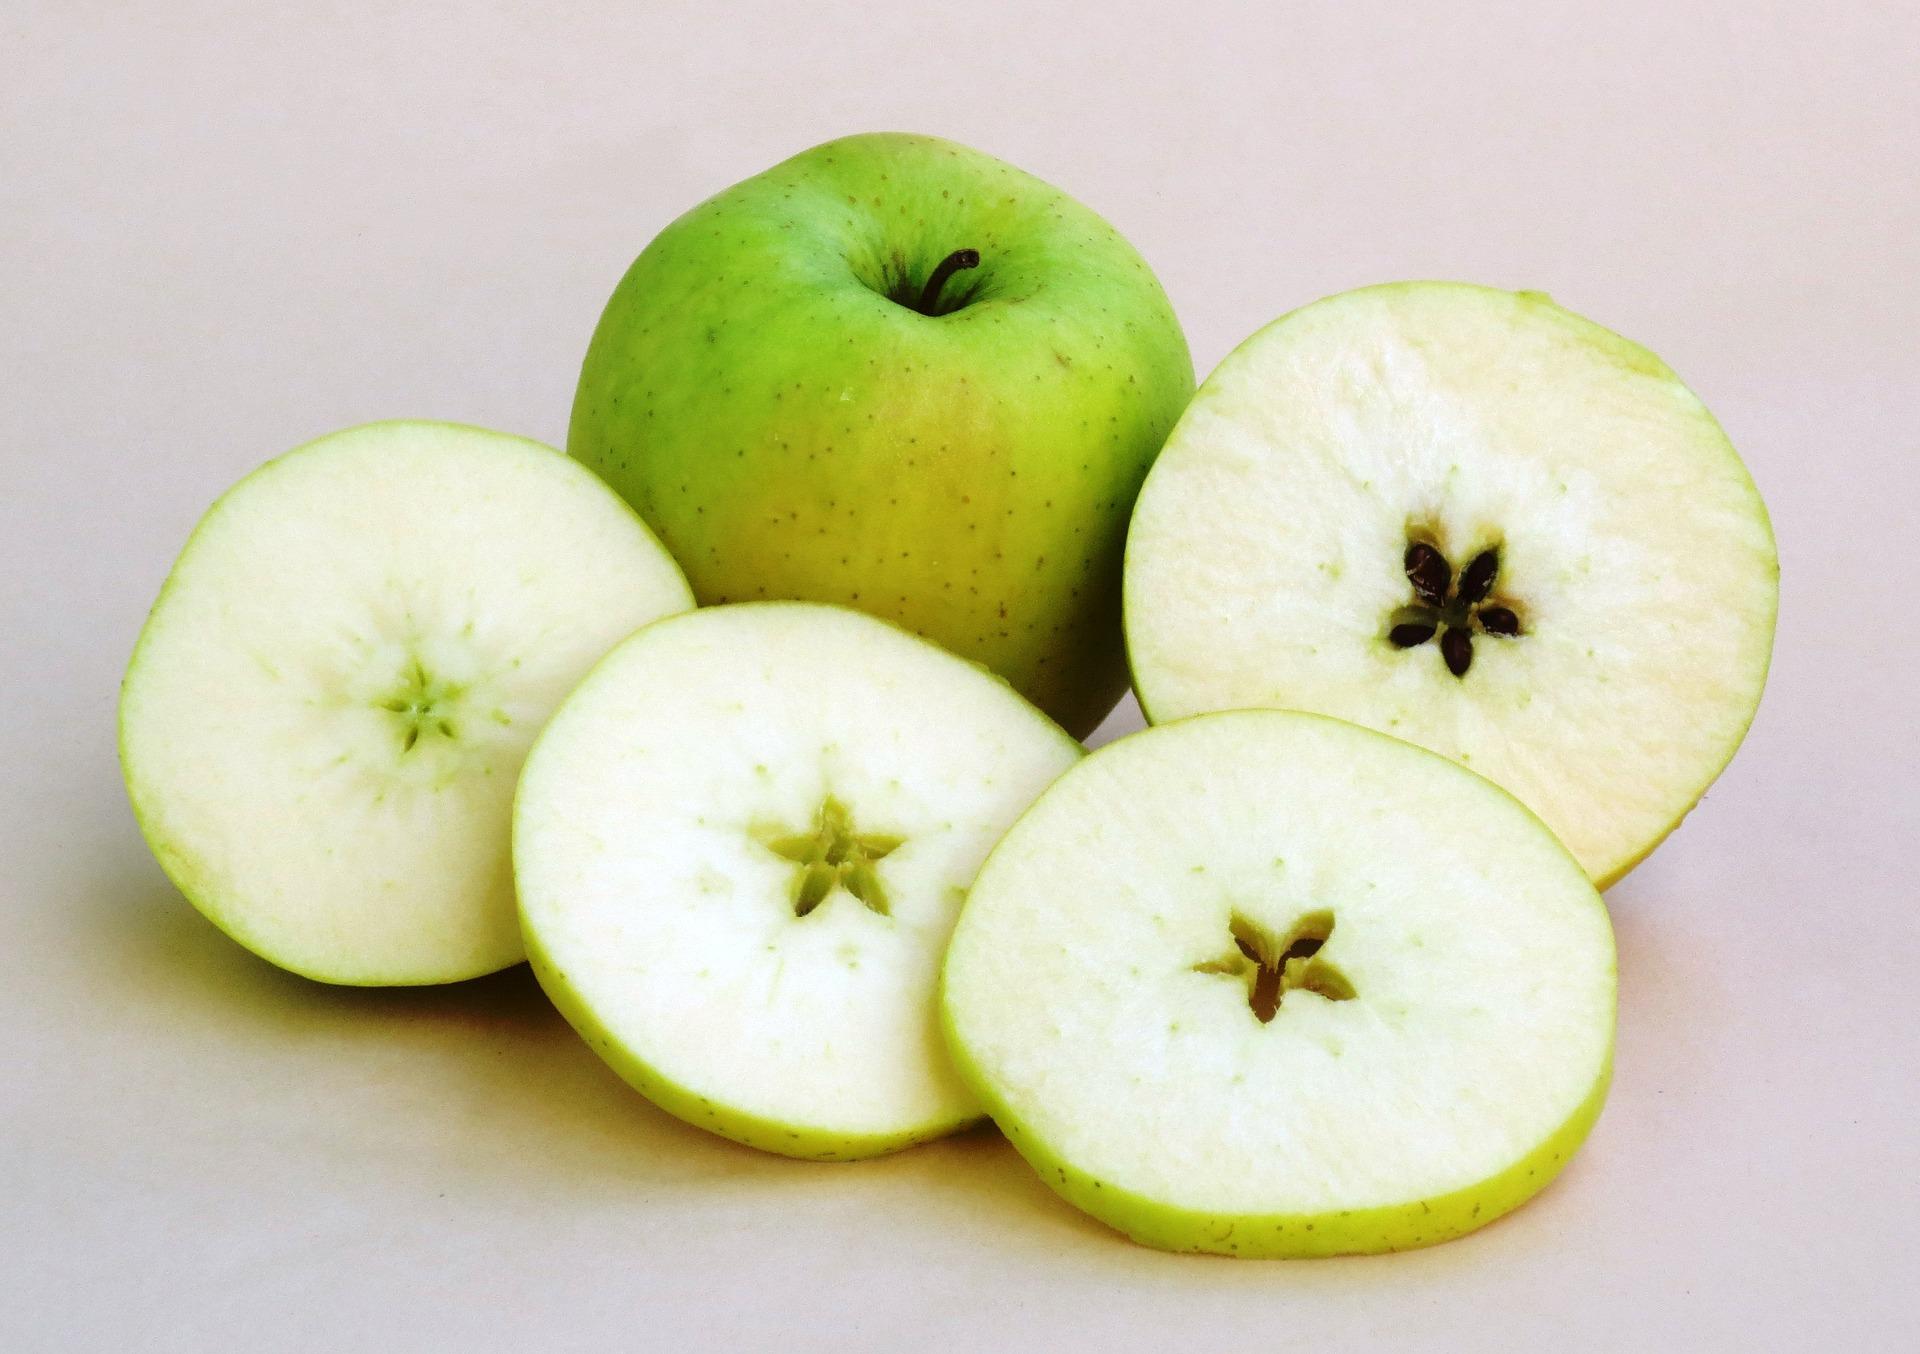 apples-899101_1920